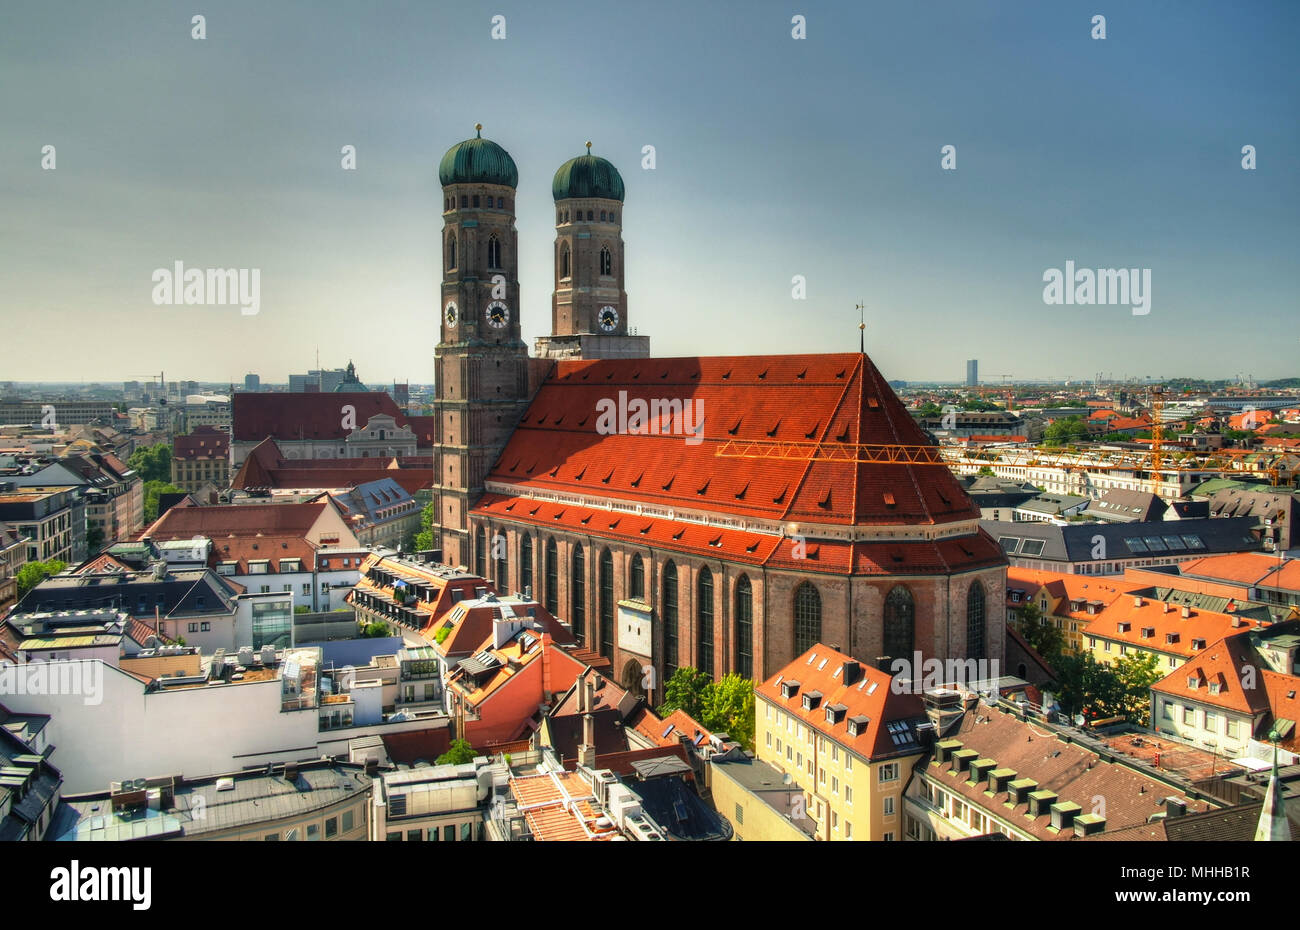 Vista aérea a la iglesia Frauenkirche Munich, Alemania Imagen De Stock